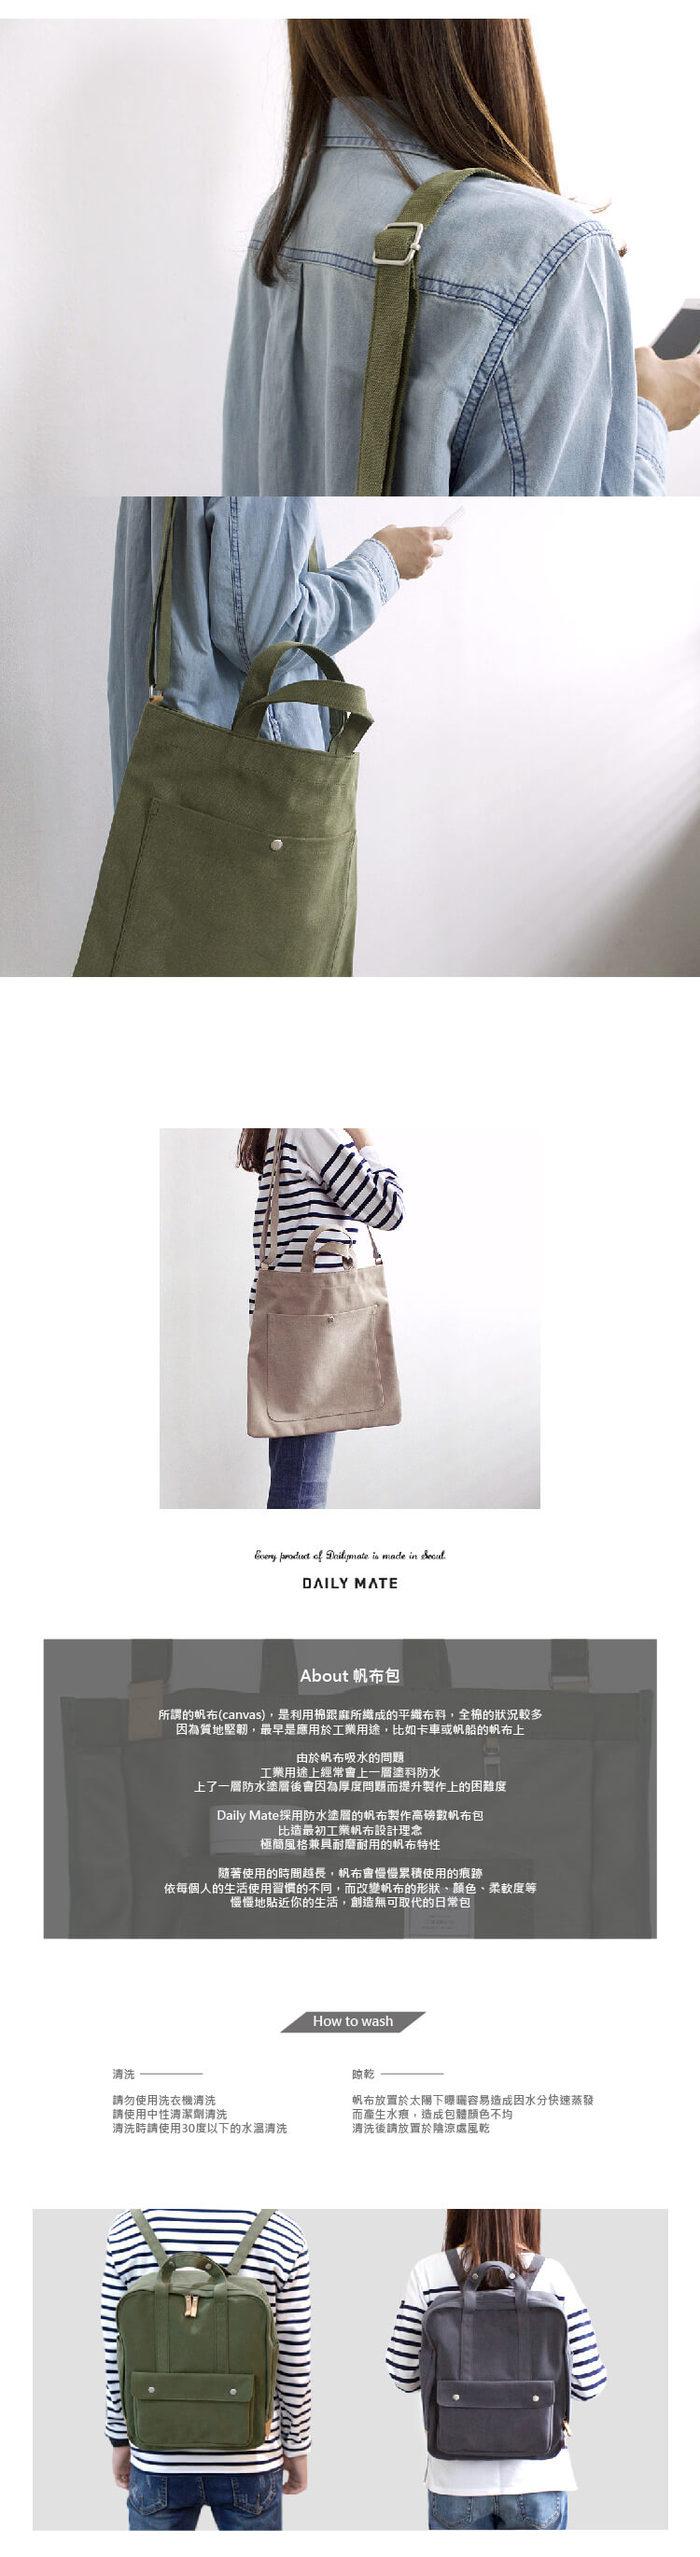 Daily mate|大尺寸肩背包(米色)